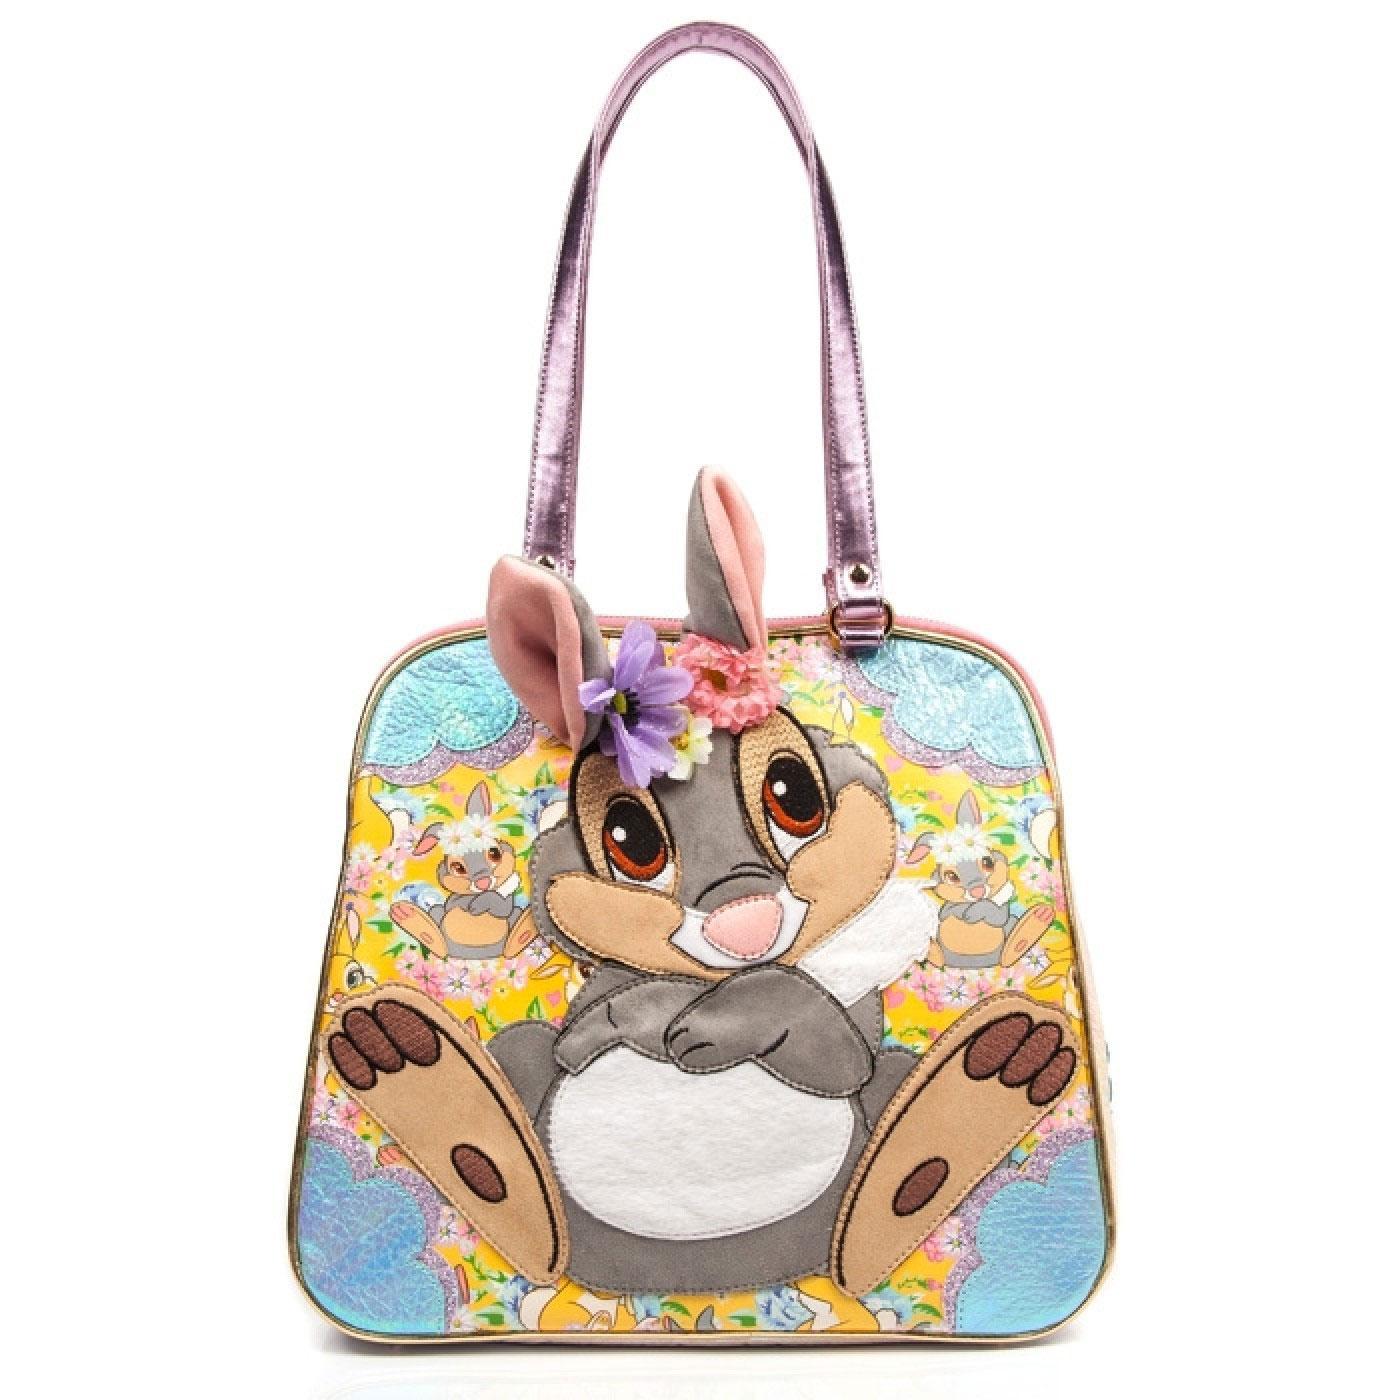 Sweet As Can Be IRREGULAR CHOICE Thumper Bag